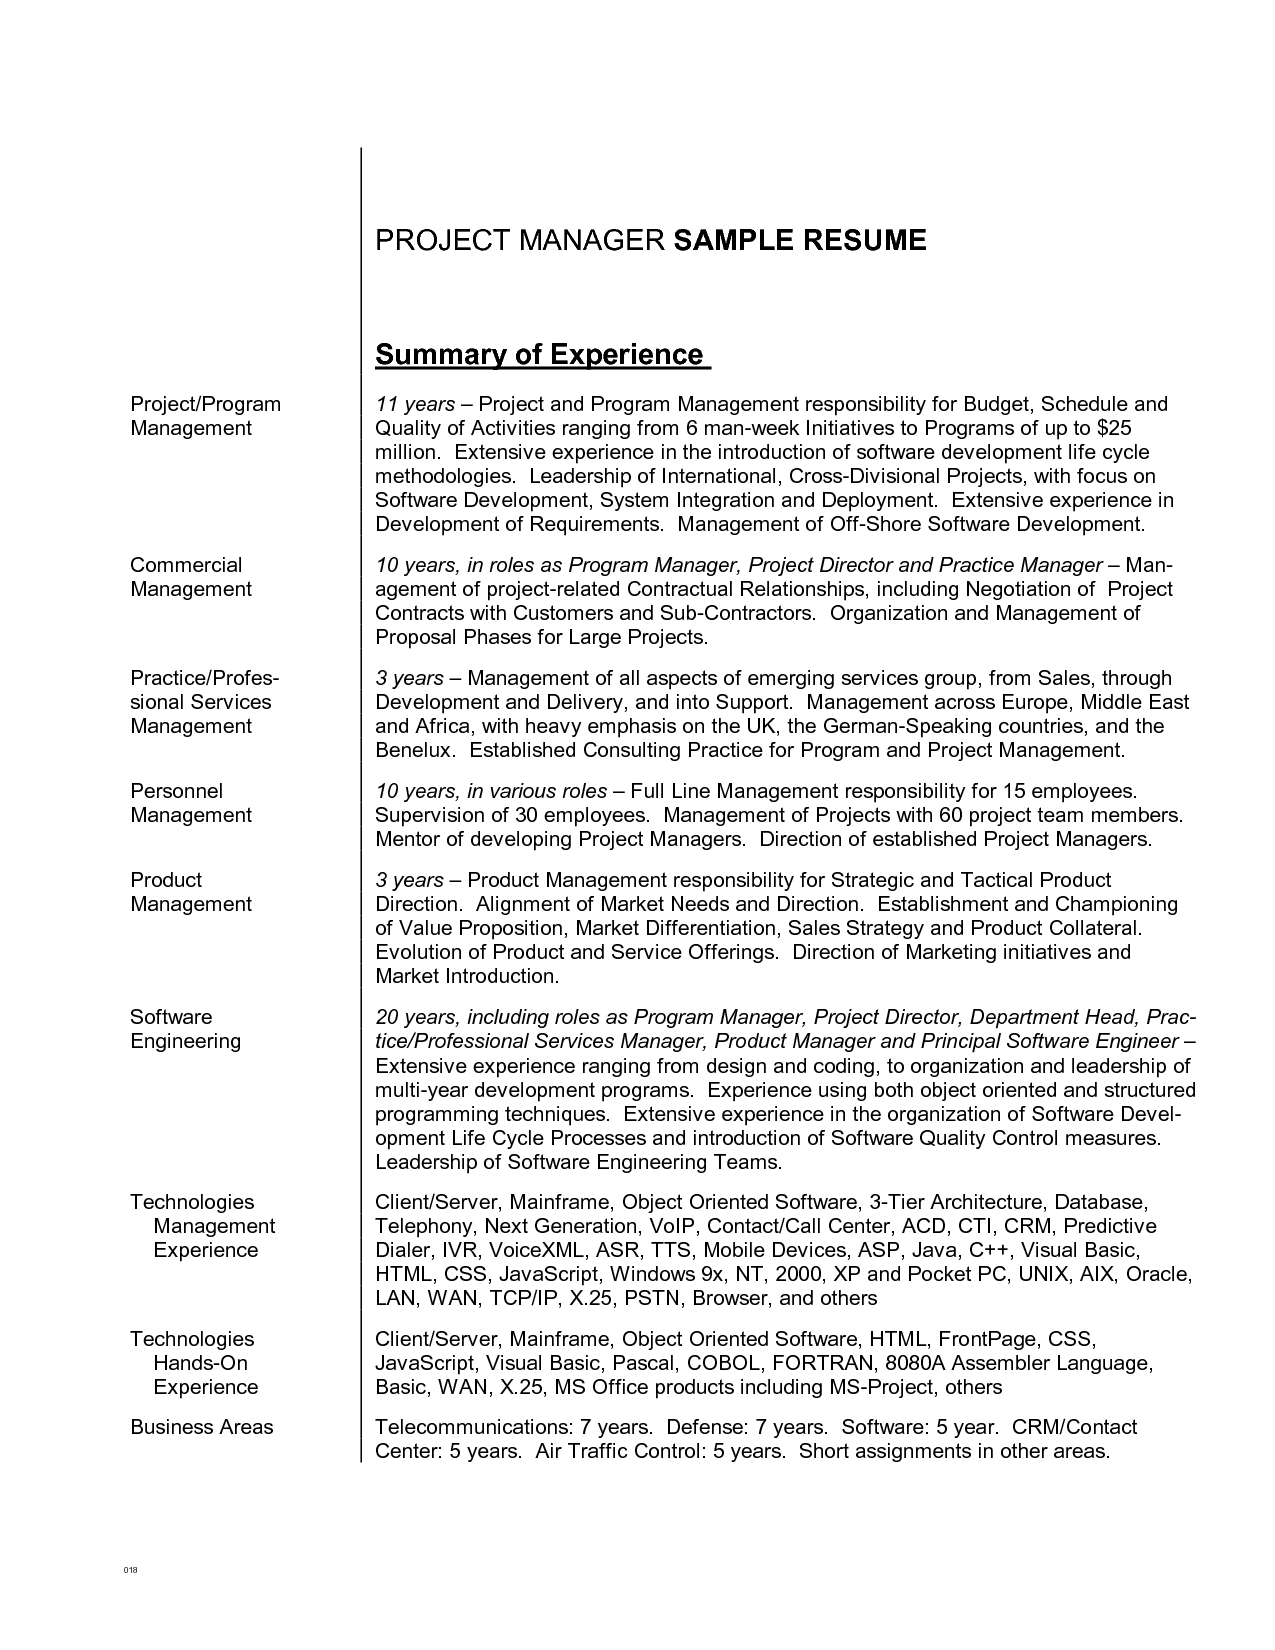 Summary On Resume Examples